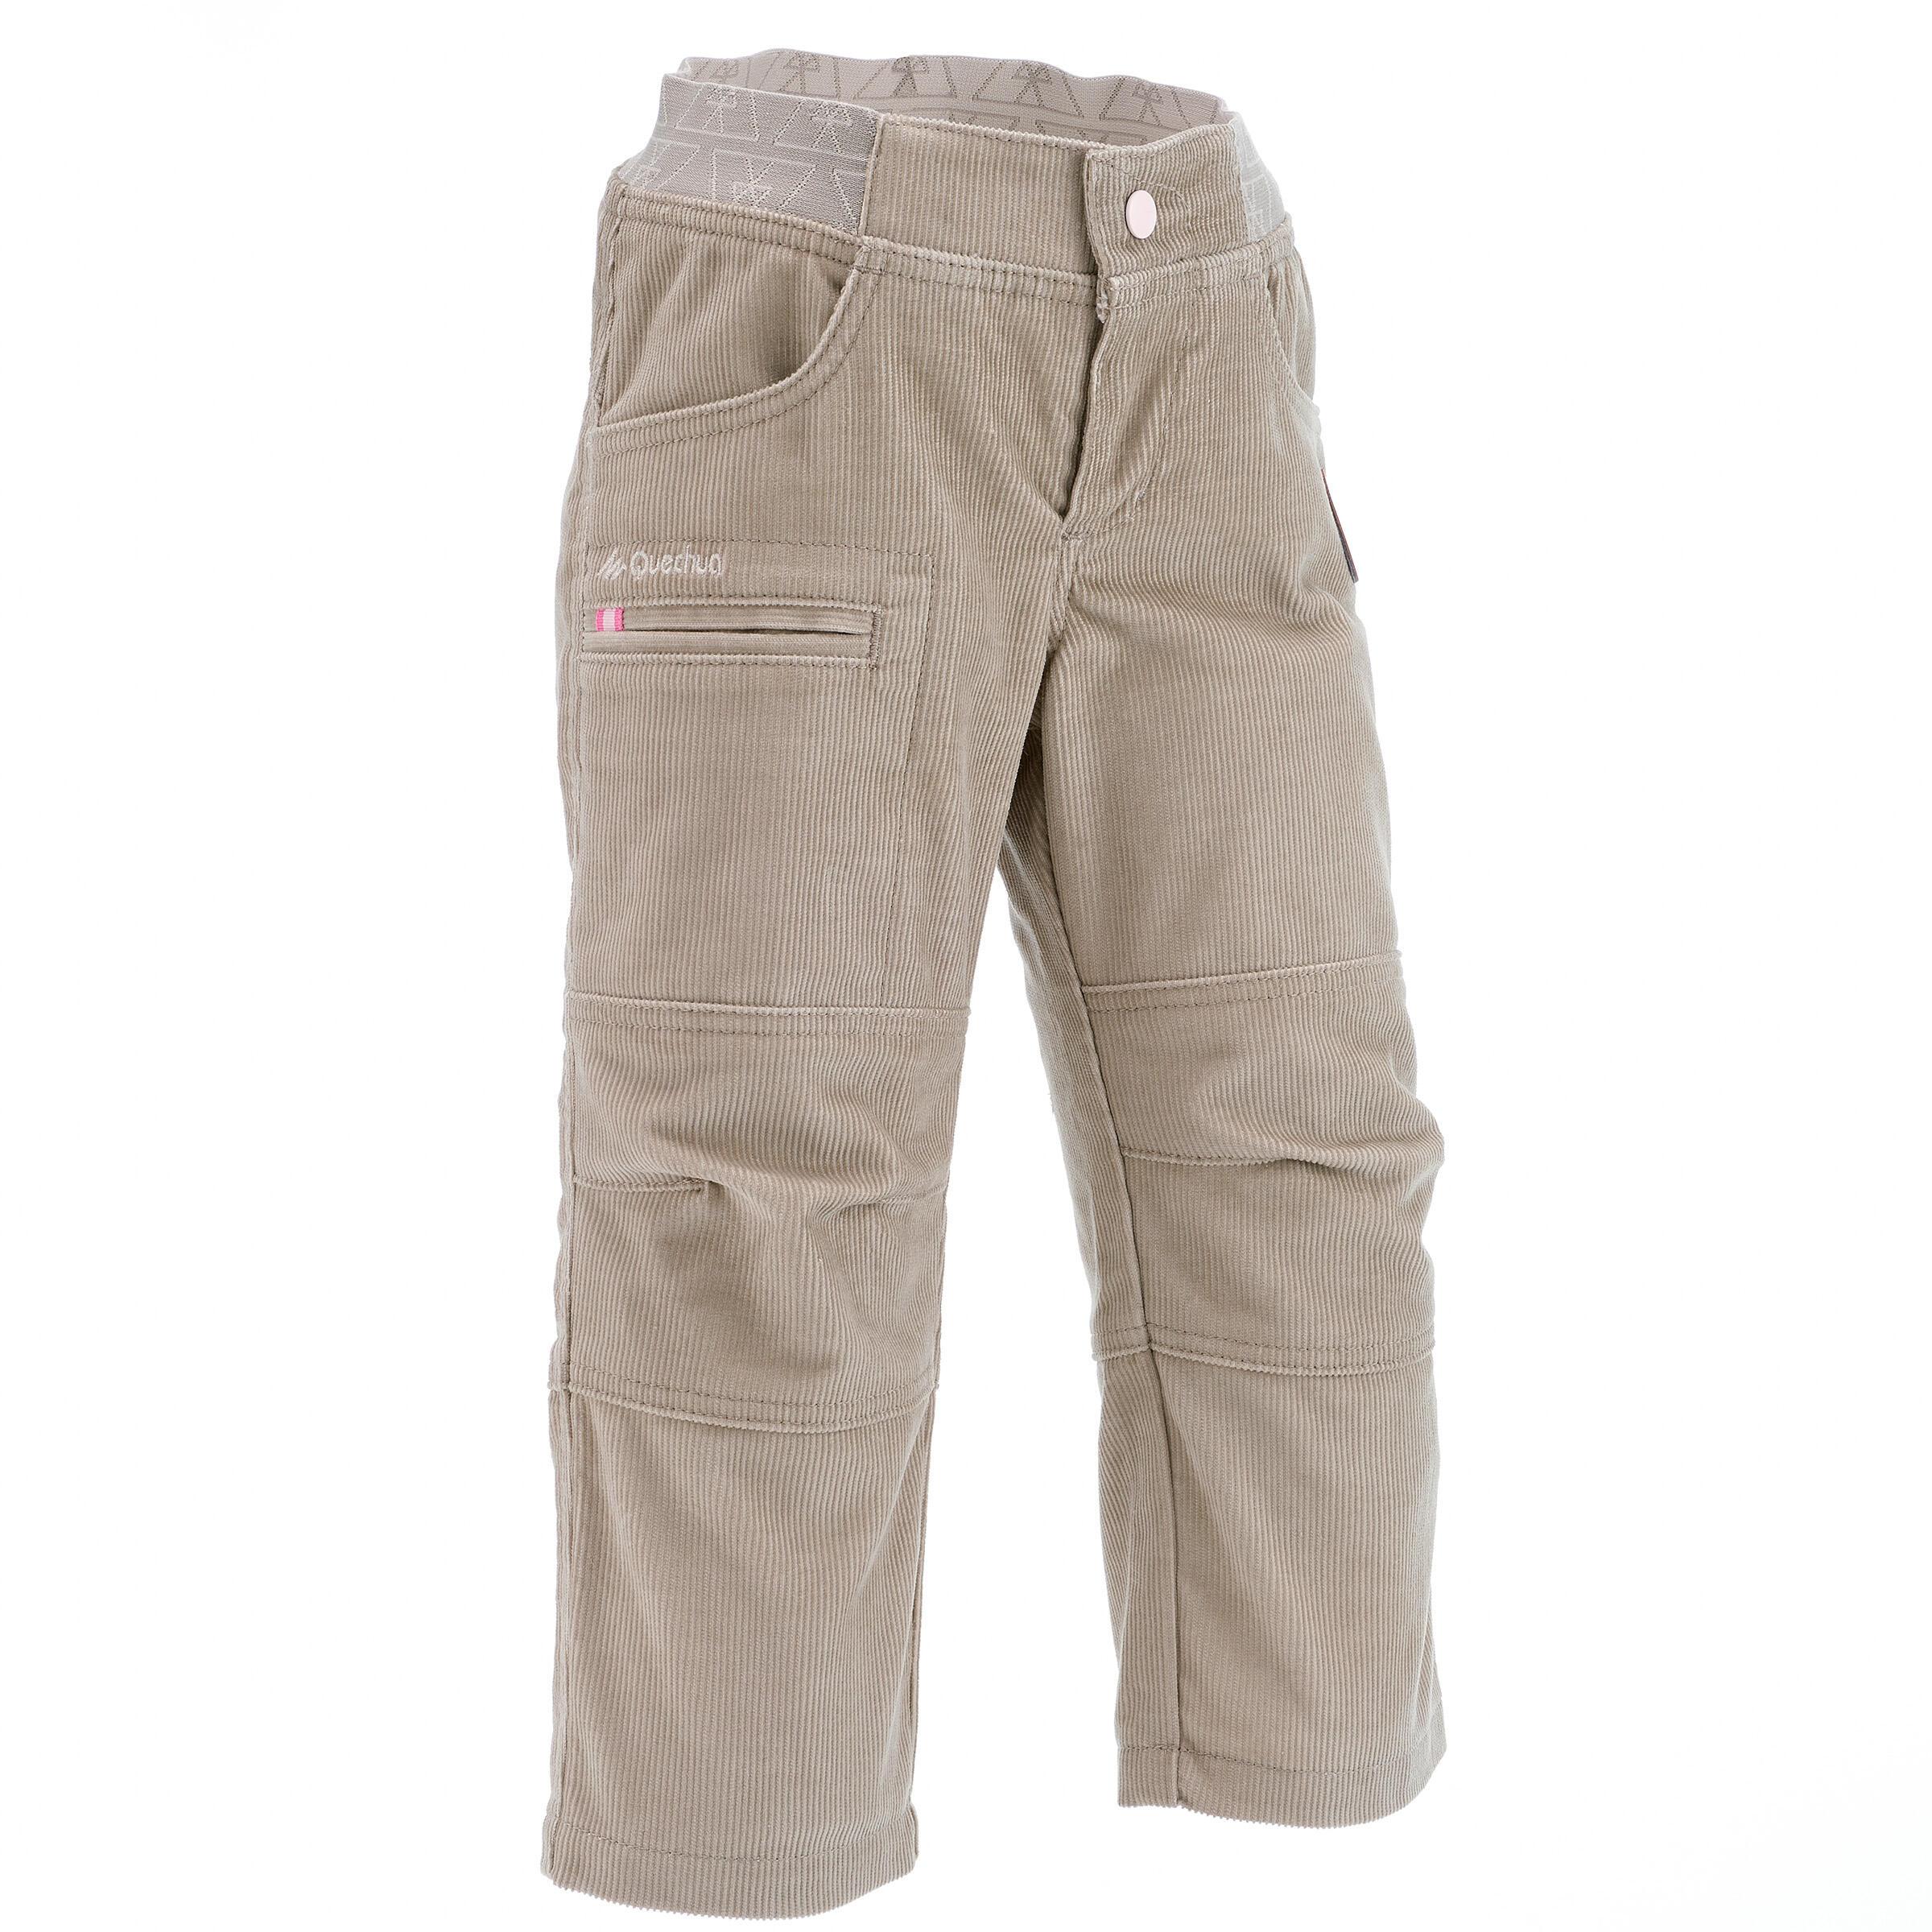 SH100 Warm Child's Snow Hiking Pants - Beige